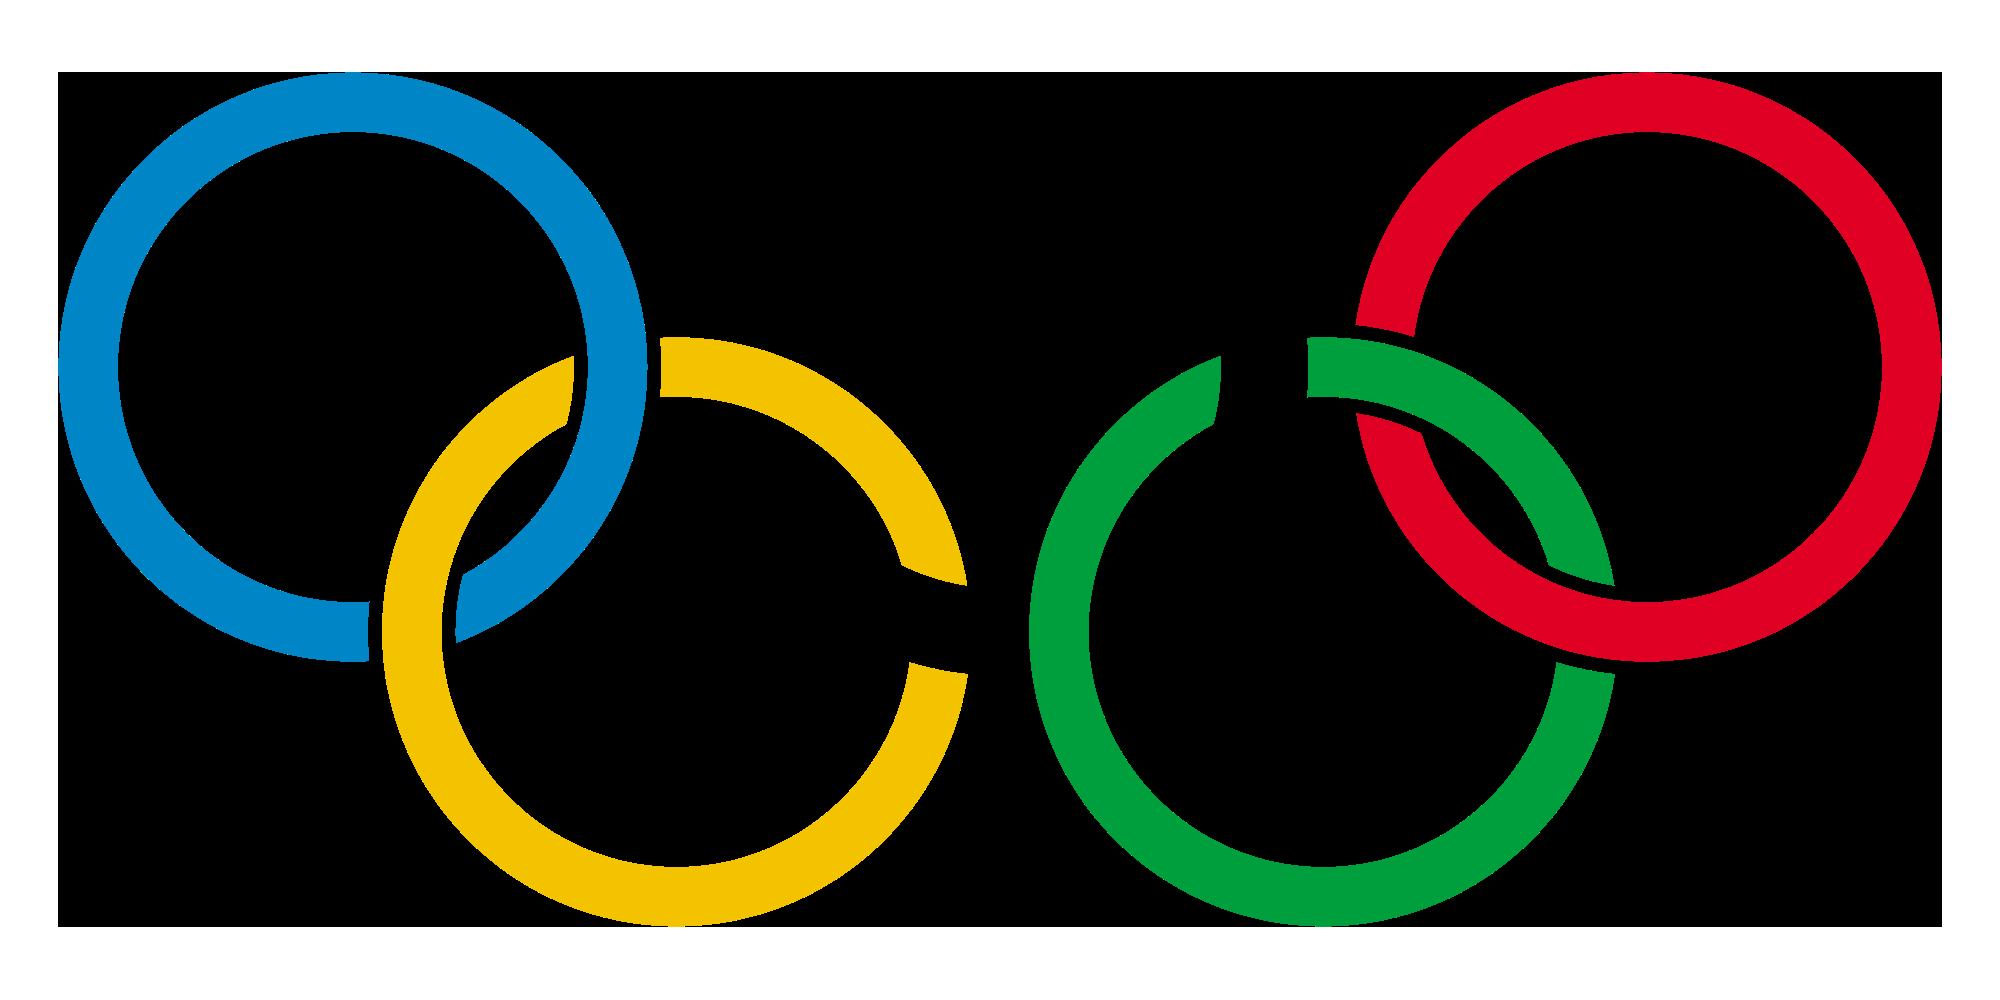 364884dcb6 Jogos Olímpicos (Olimpíadas) - Espores - InfoEscola